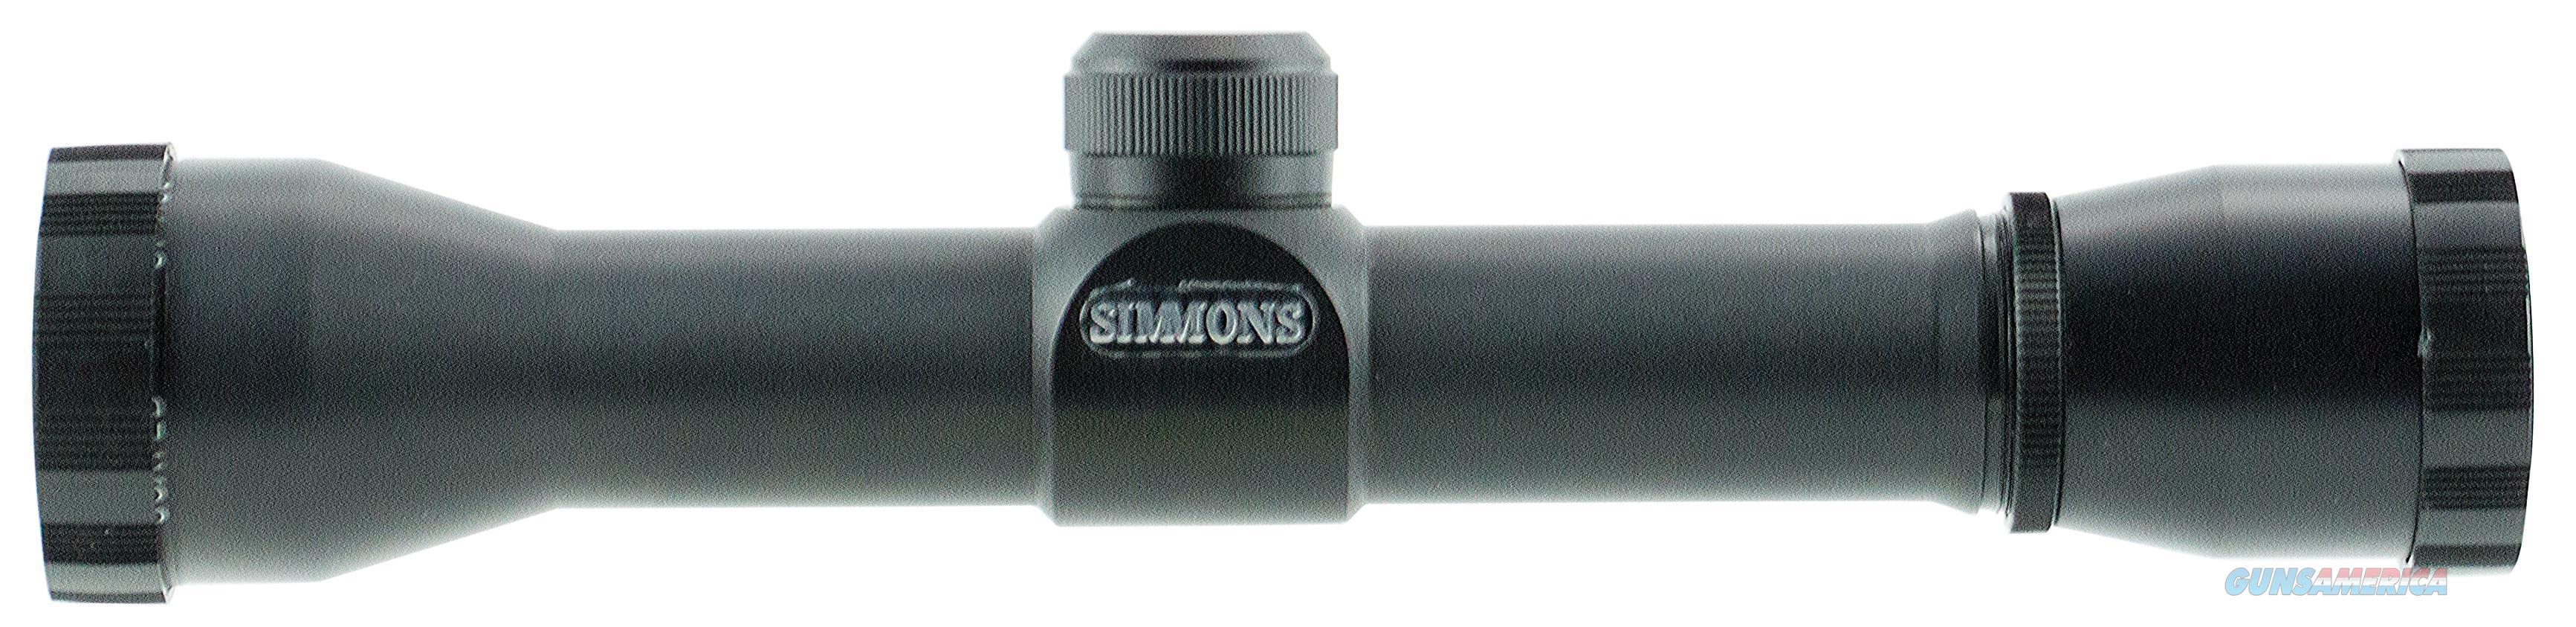 "Simmons 807738 Pro Hunter 4X 32Mm Obj 15 Ft @ 100 Yds Fov 1"" Tube Black Matte Truplex 807738  Non-Guns > Scopes/Mounts/Rings & Optics > Rifle Scopes > Variable Focal Length"